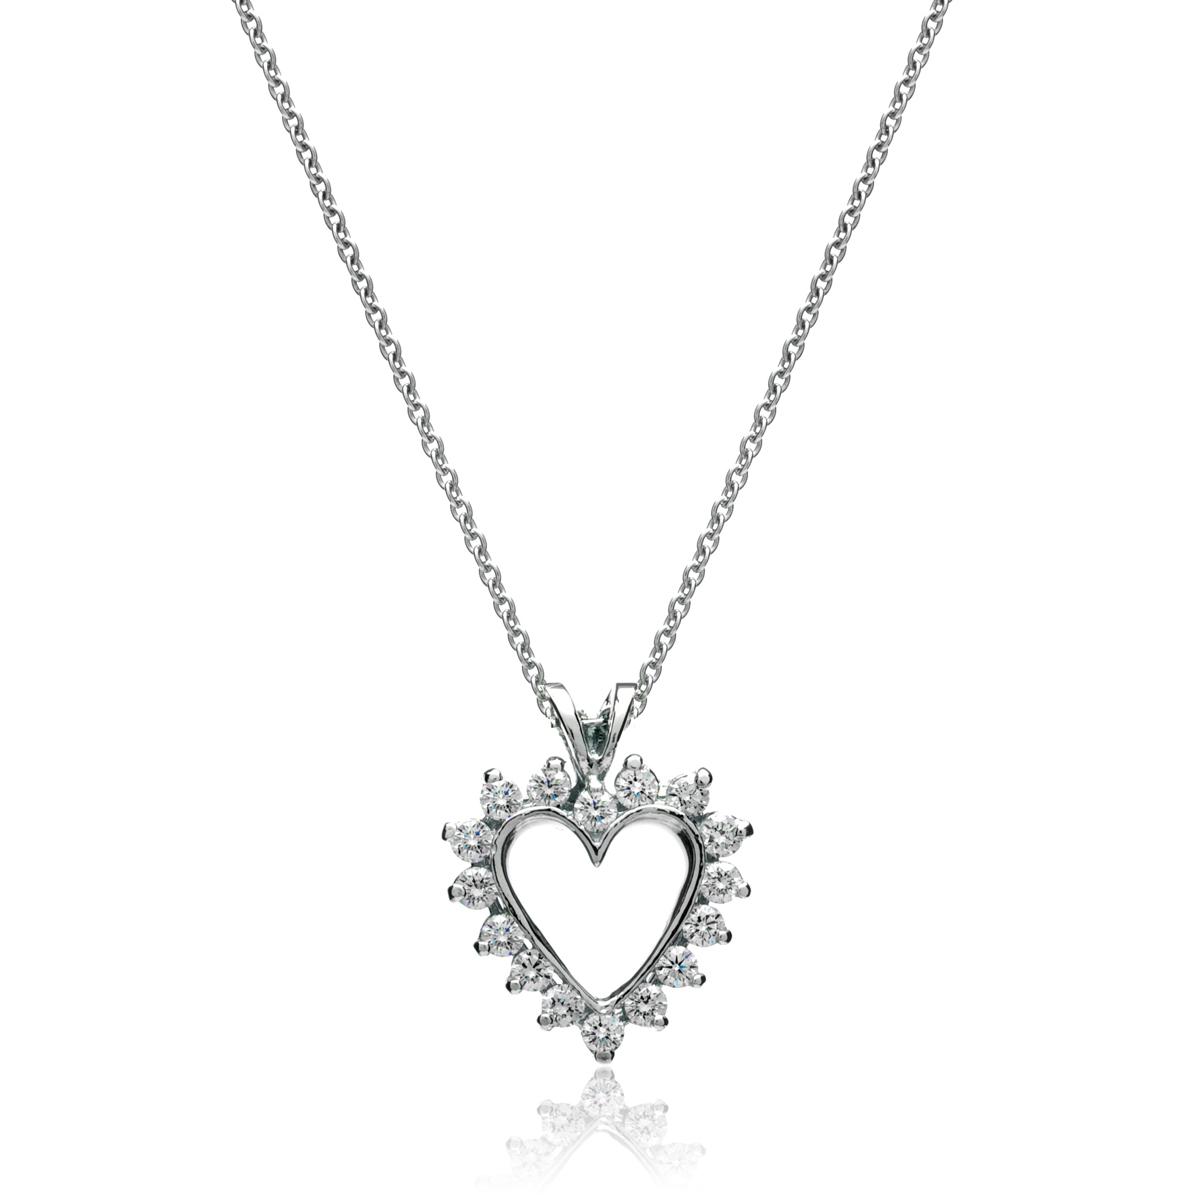 1200x1200 White Gold Diamond Heart Pendant Jm Edwards Jewelry